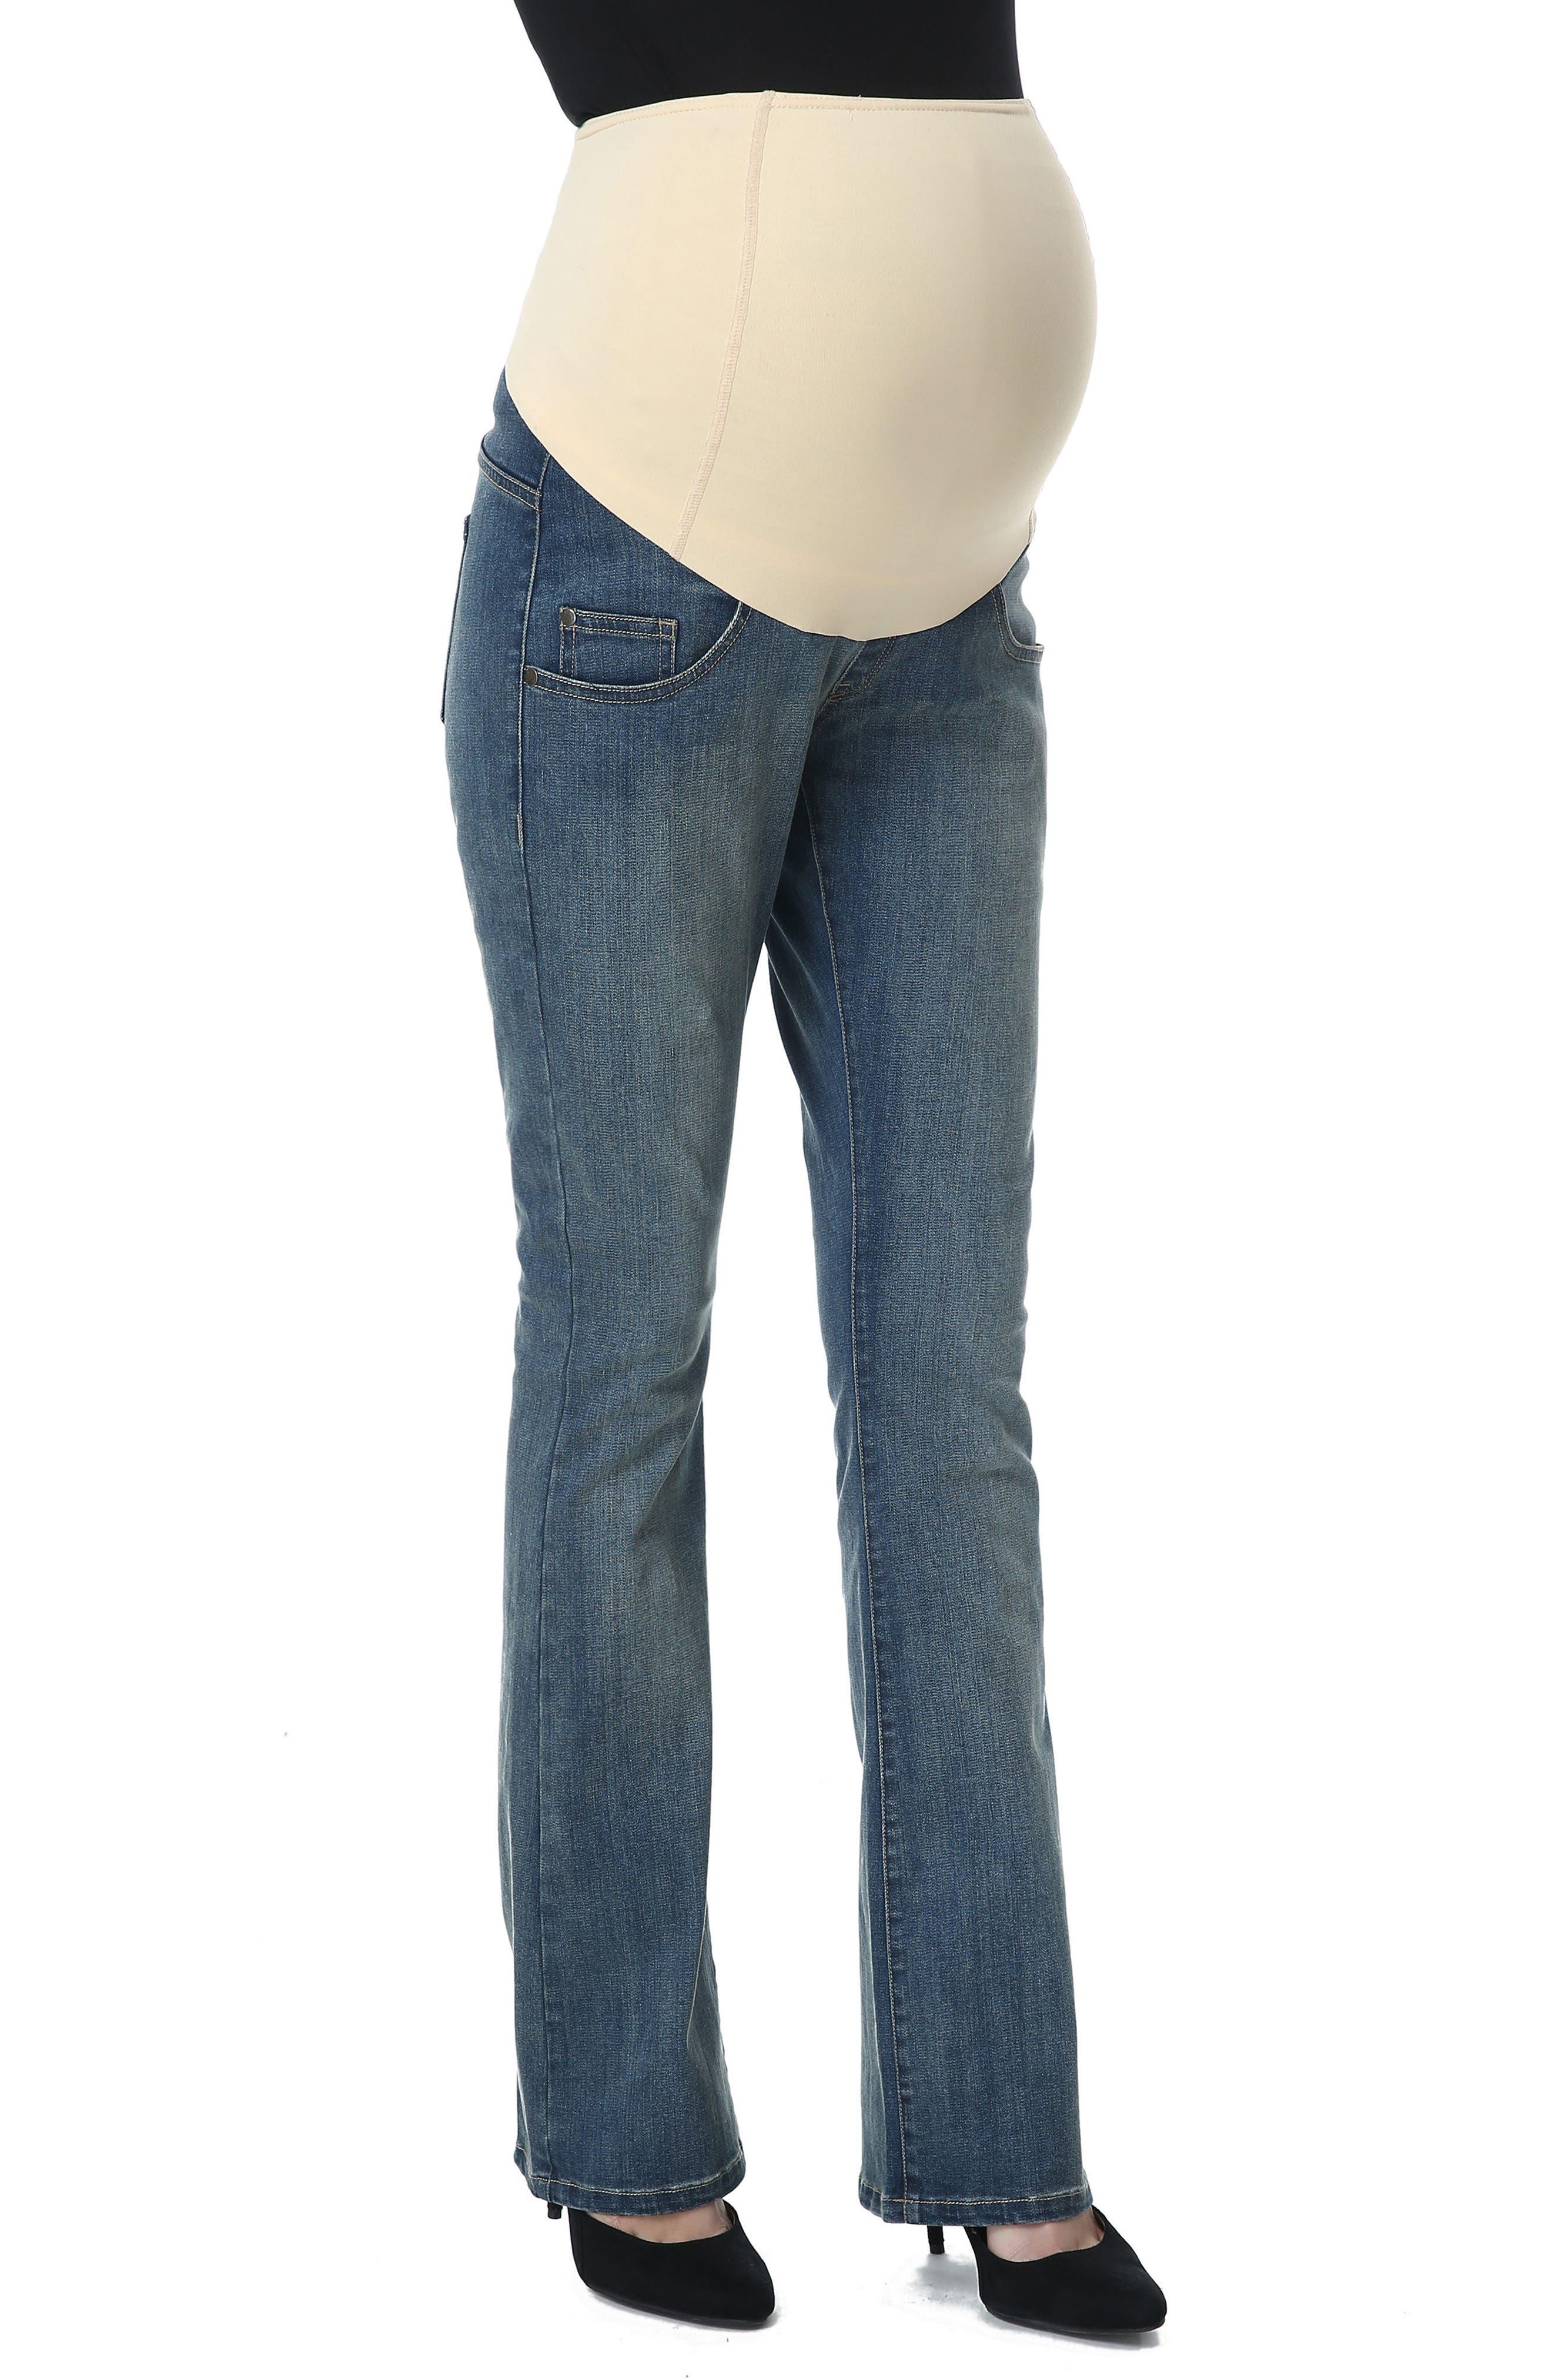 Dixie Maternity Flare Jeans,                             Main thumbnail 1, color,                             Medium Indigo